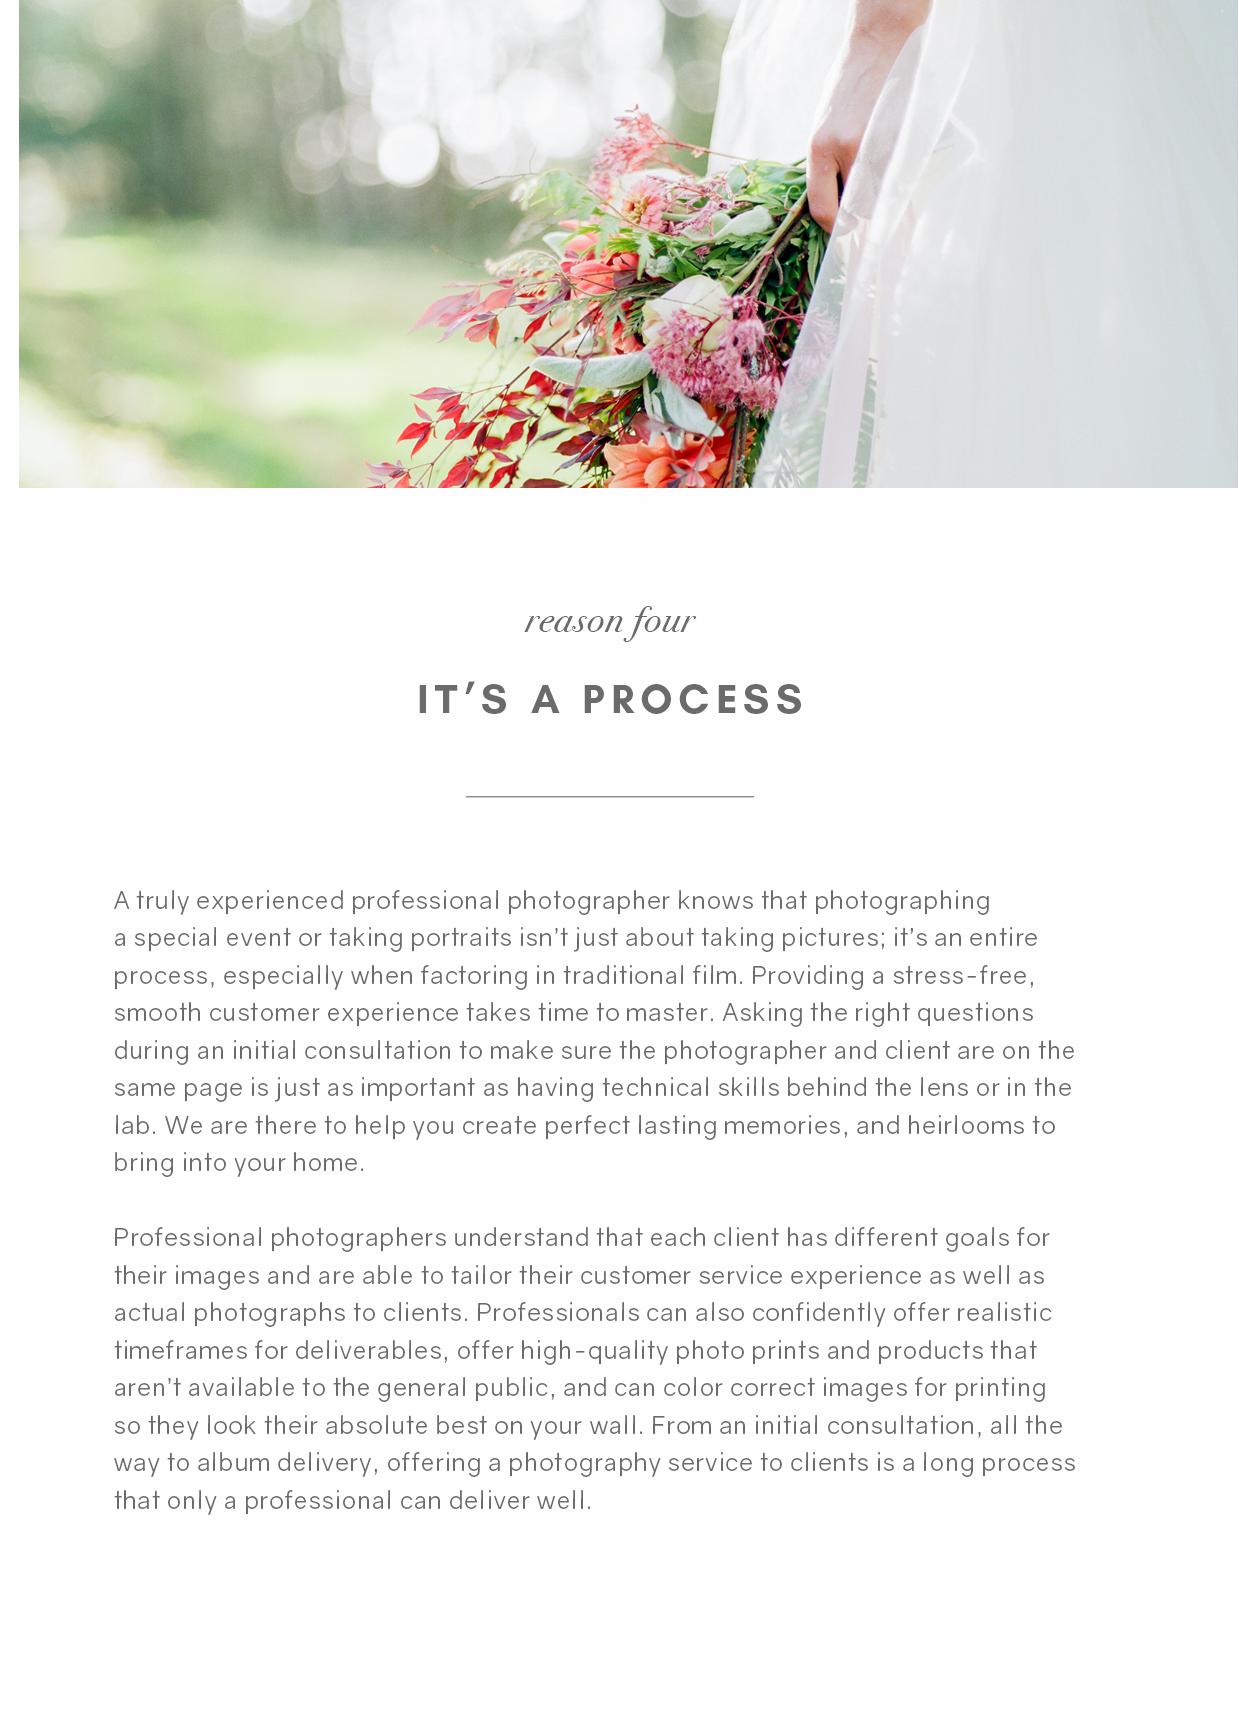 PageFive-Portland-Oregon-Wedding-Planning.jpg